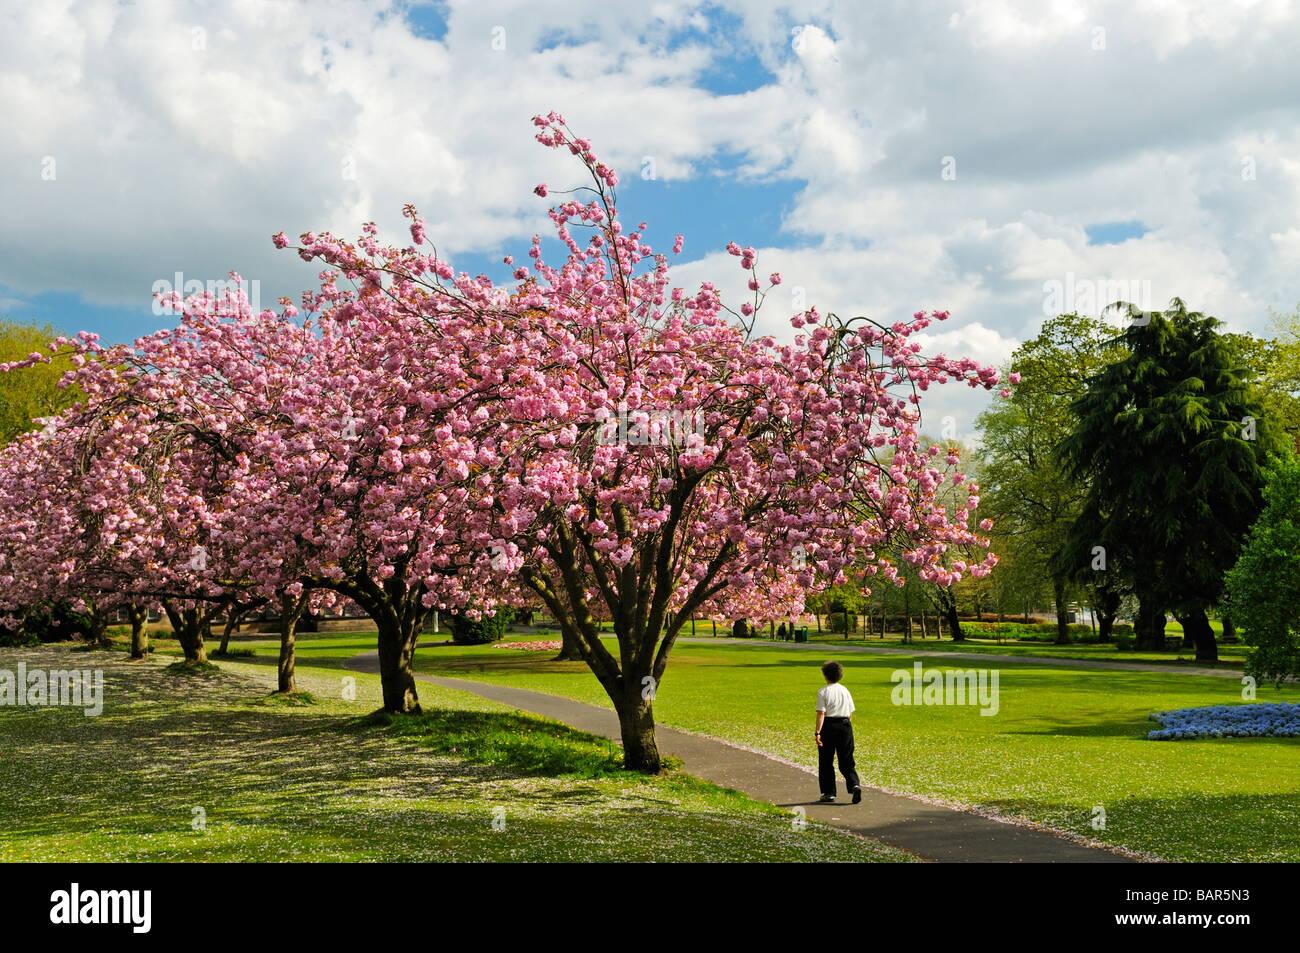 Ornamental Flowering Cherry Trees In Blossom Potternewton Park